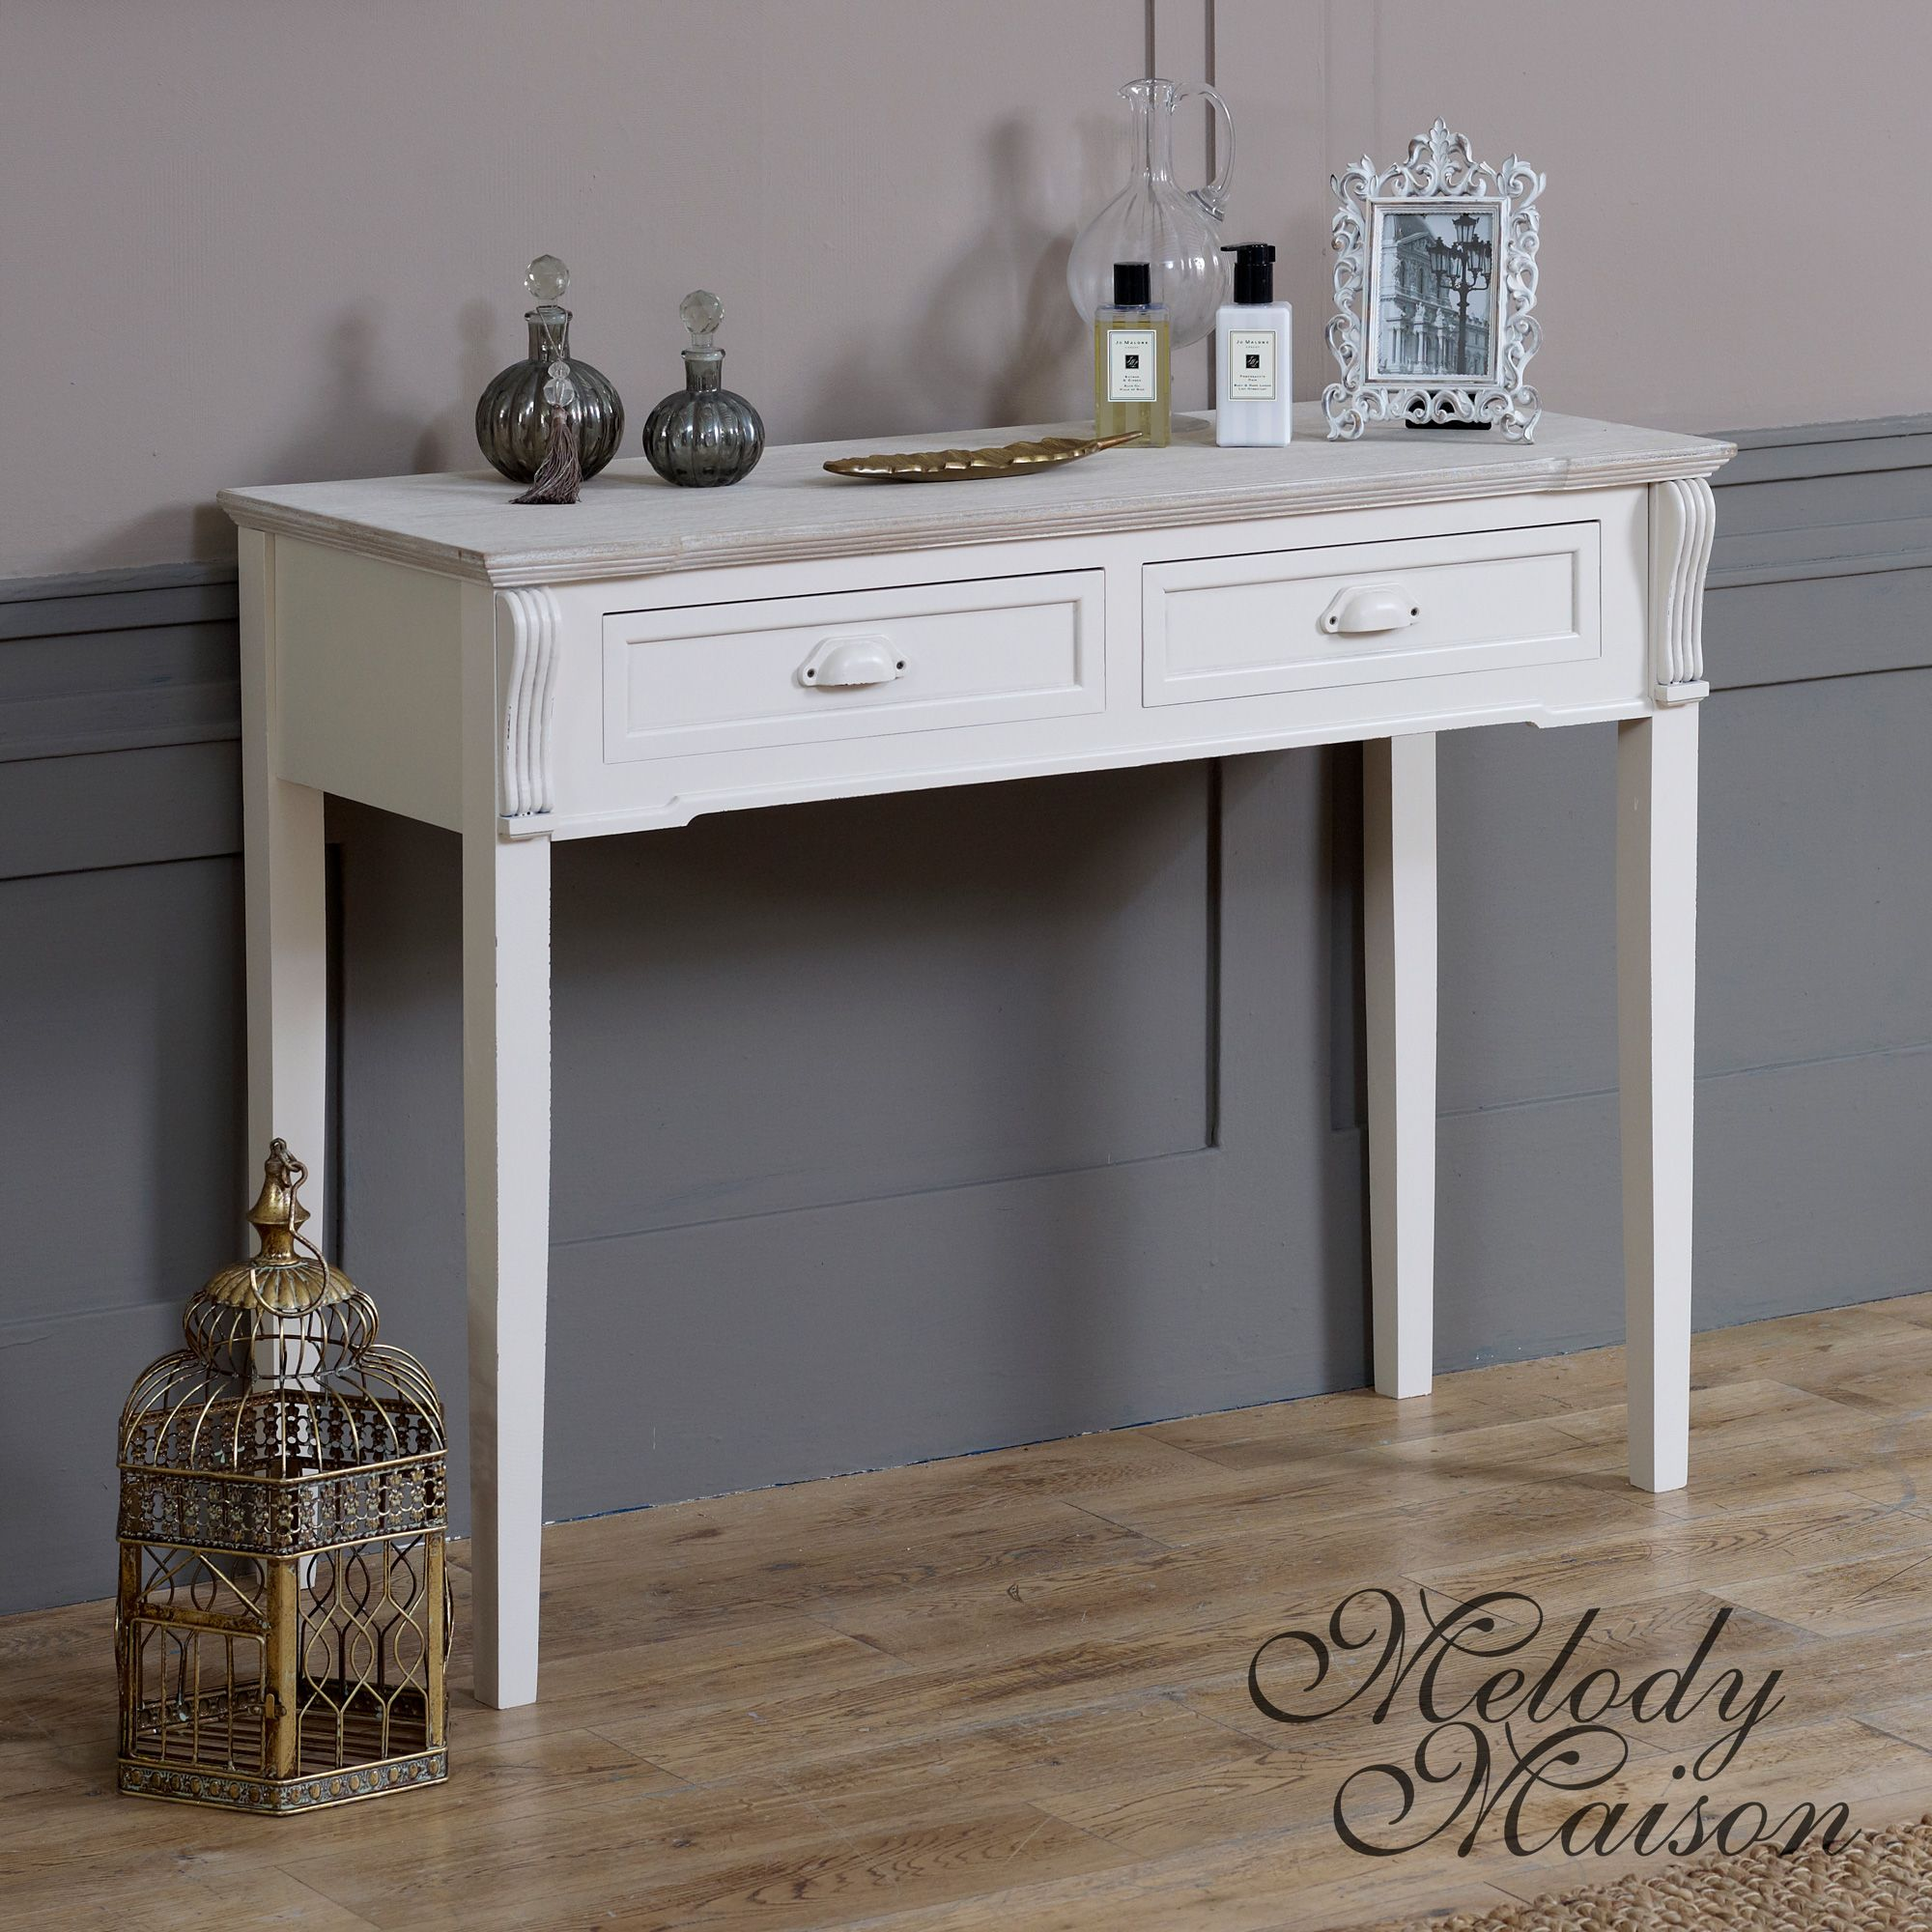 Cream 2 drawer consoledressing table lyon range lyon french cream 2 drawer consoledressing table lyon range french country styledressing geotapseo Gallery